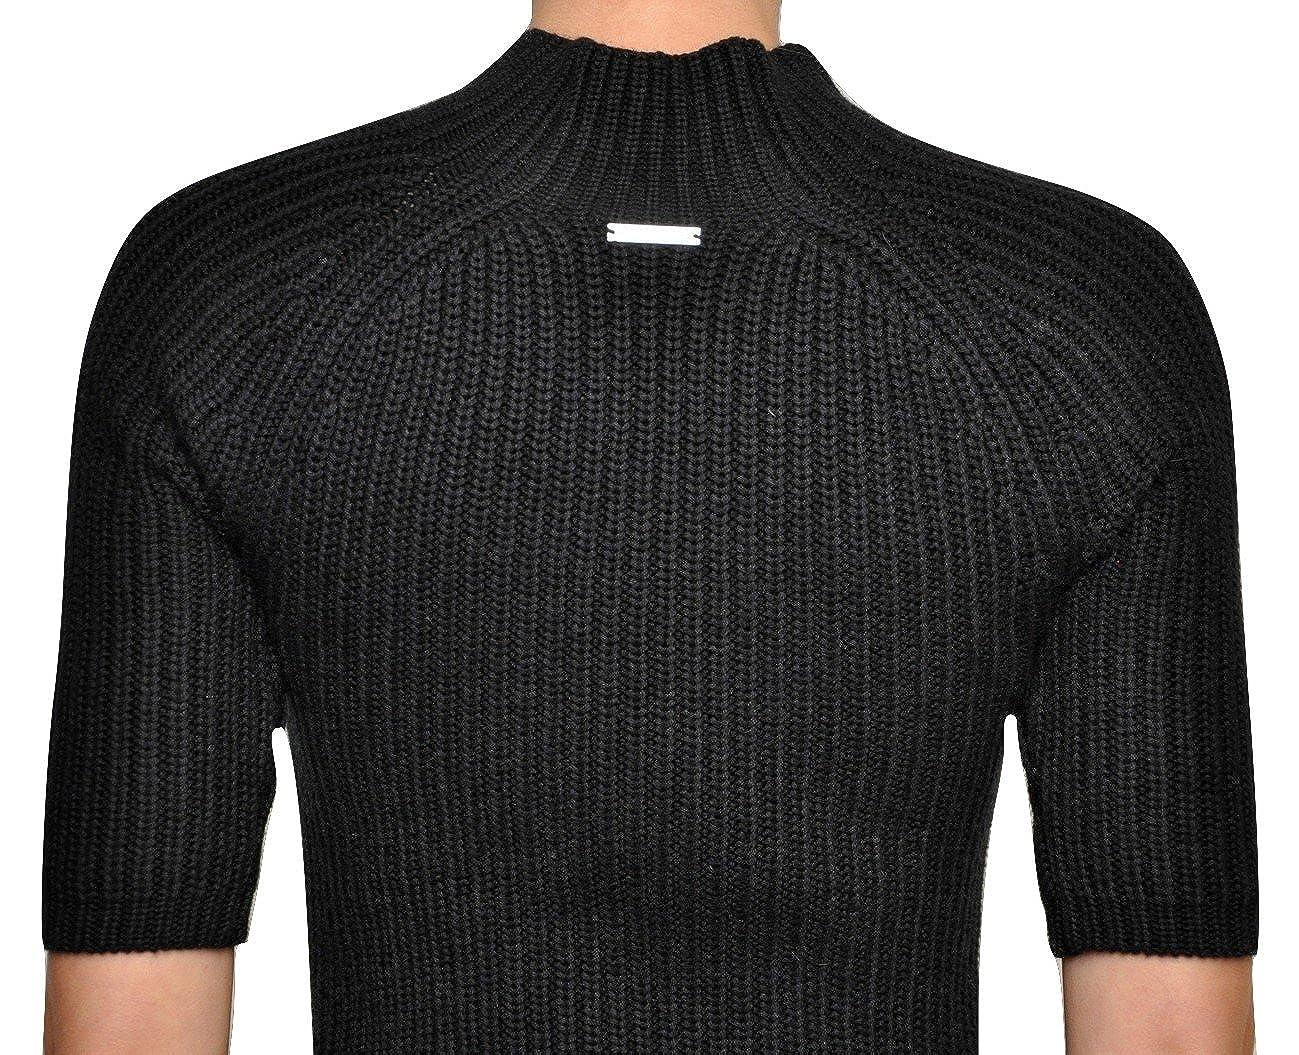 e891c89b9e3 Michael Kors Women s Short Sleeve Sweater at Amazon Women s Clothing store